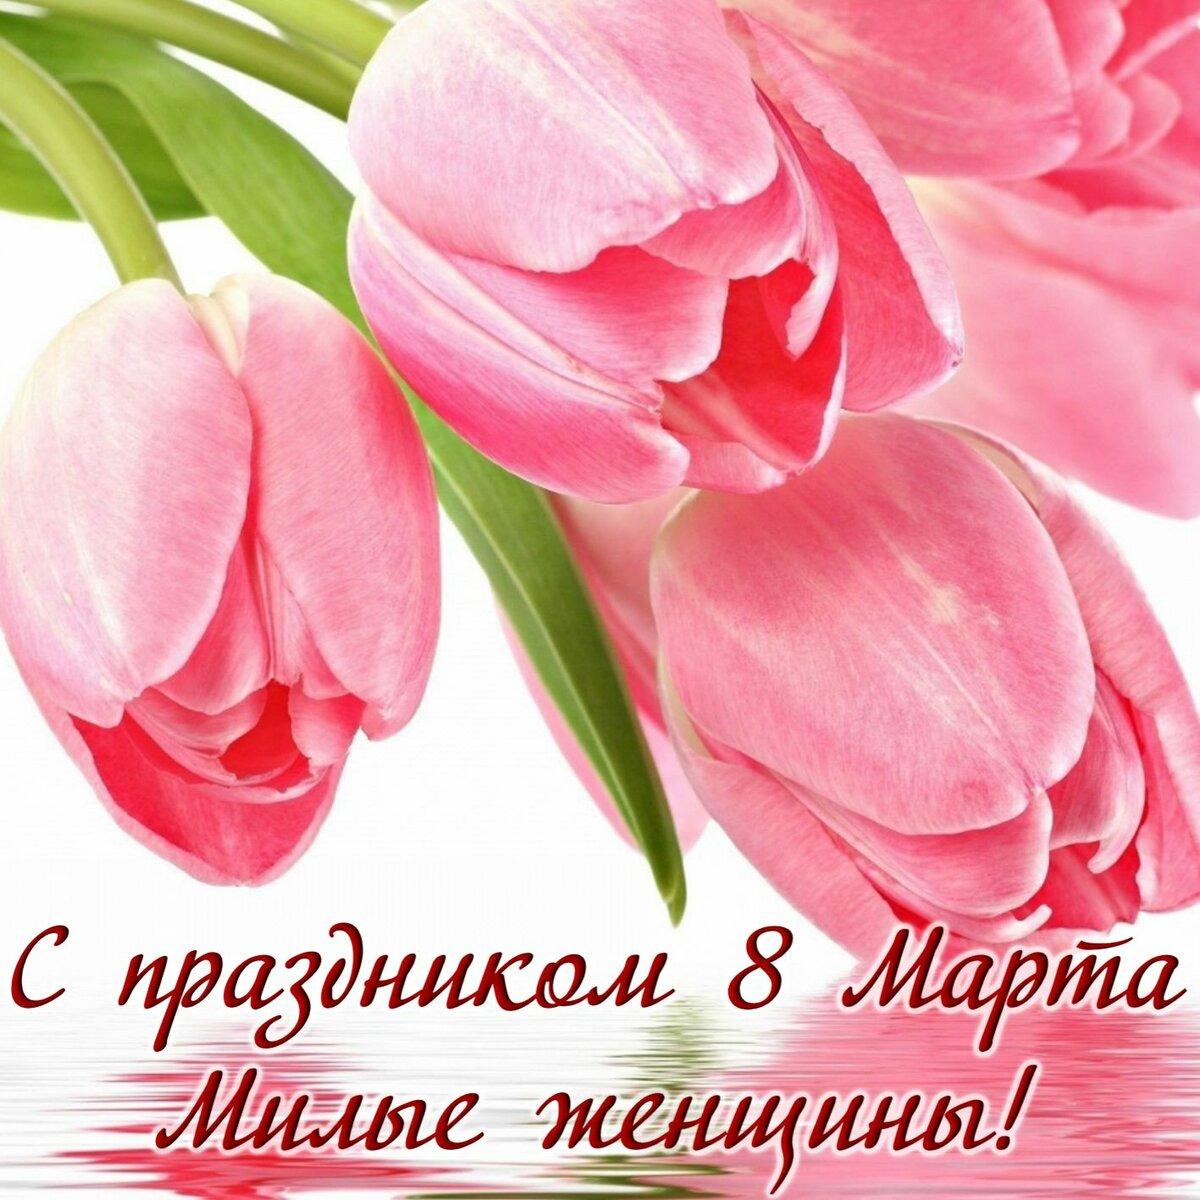 Картинки 8 марта картинки